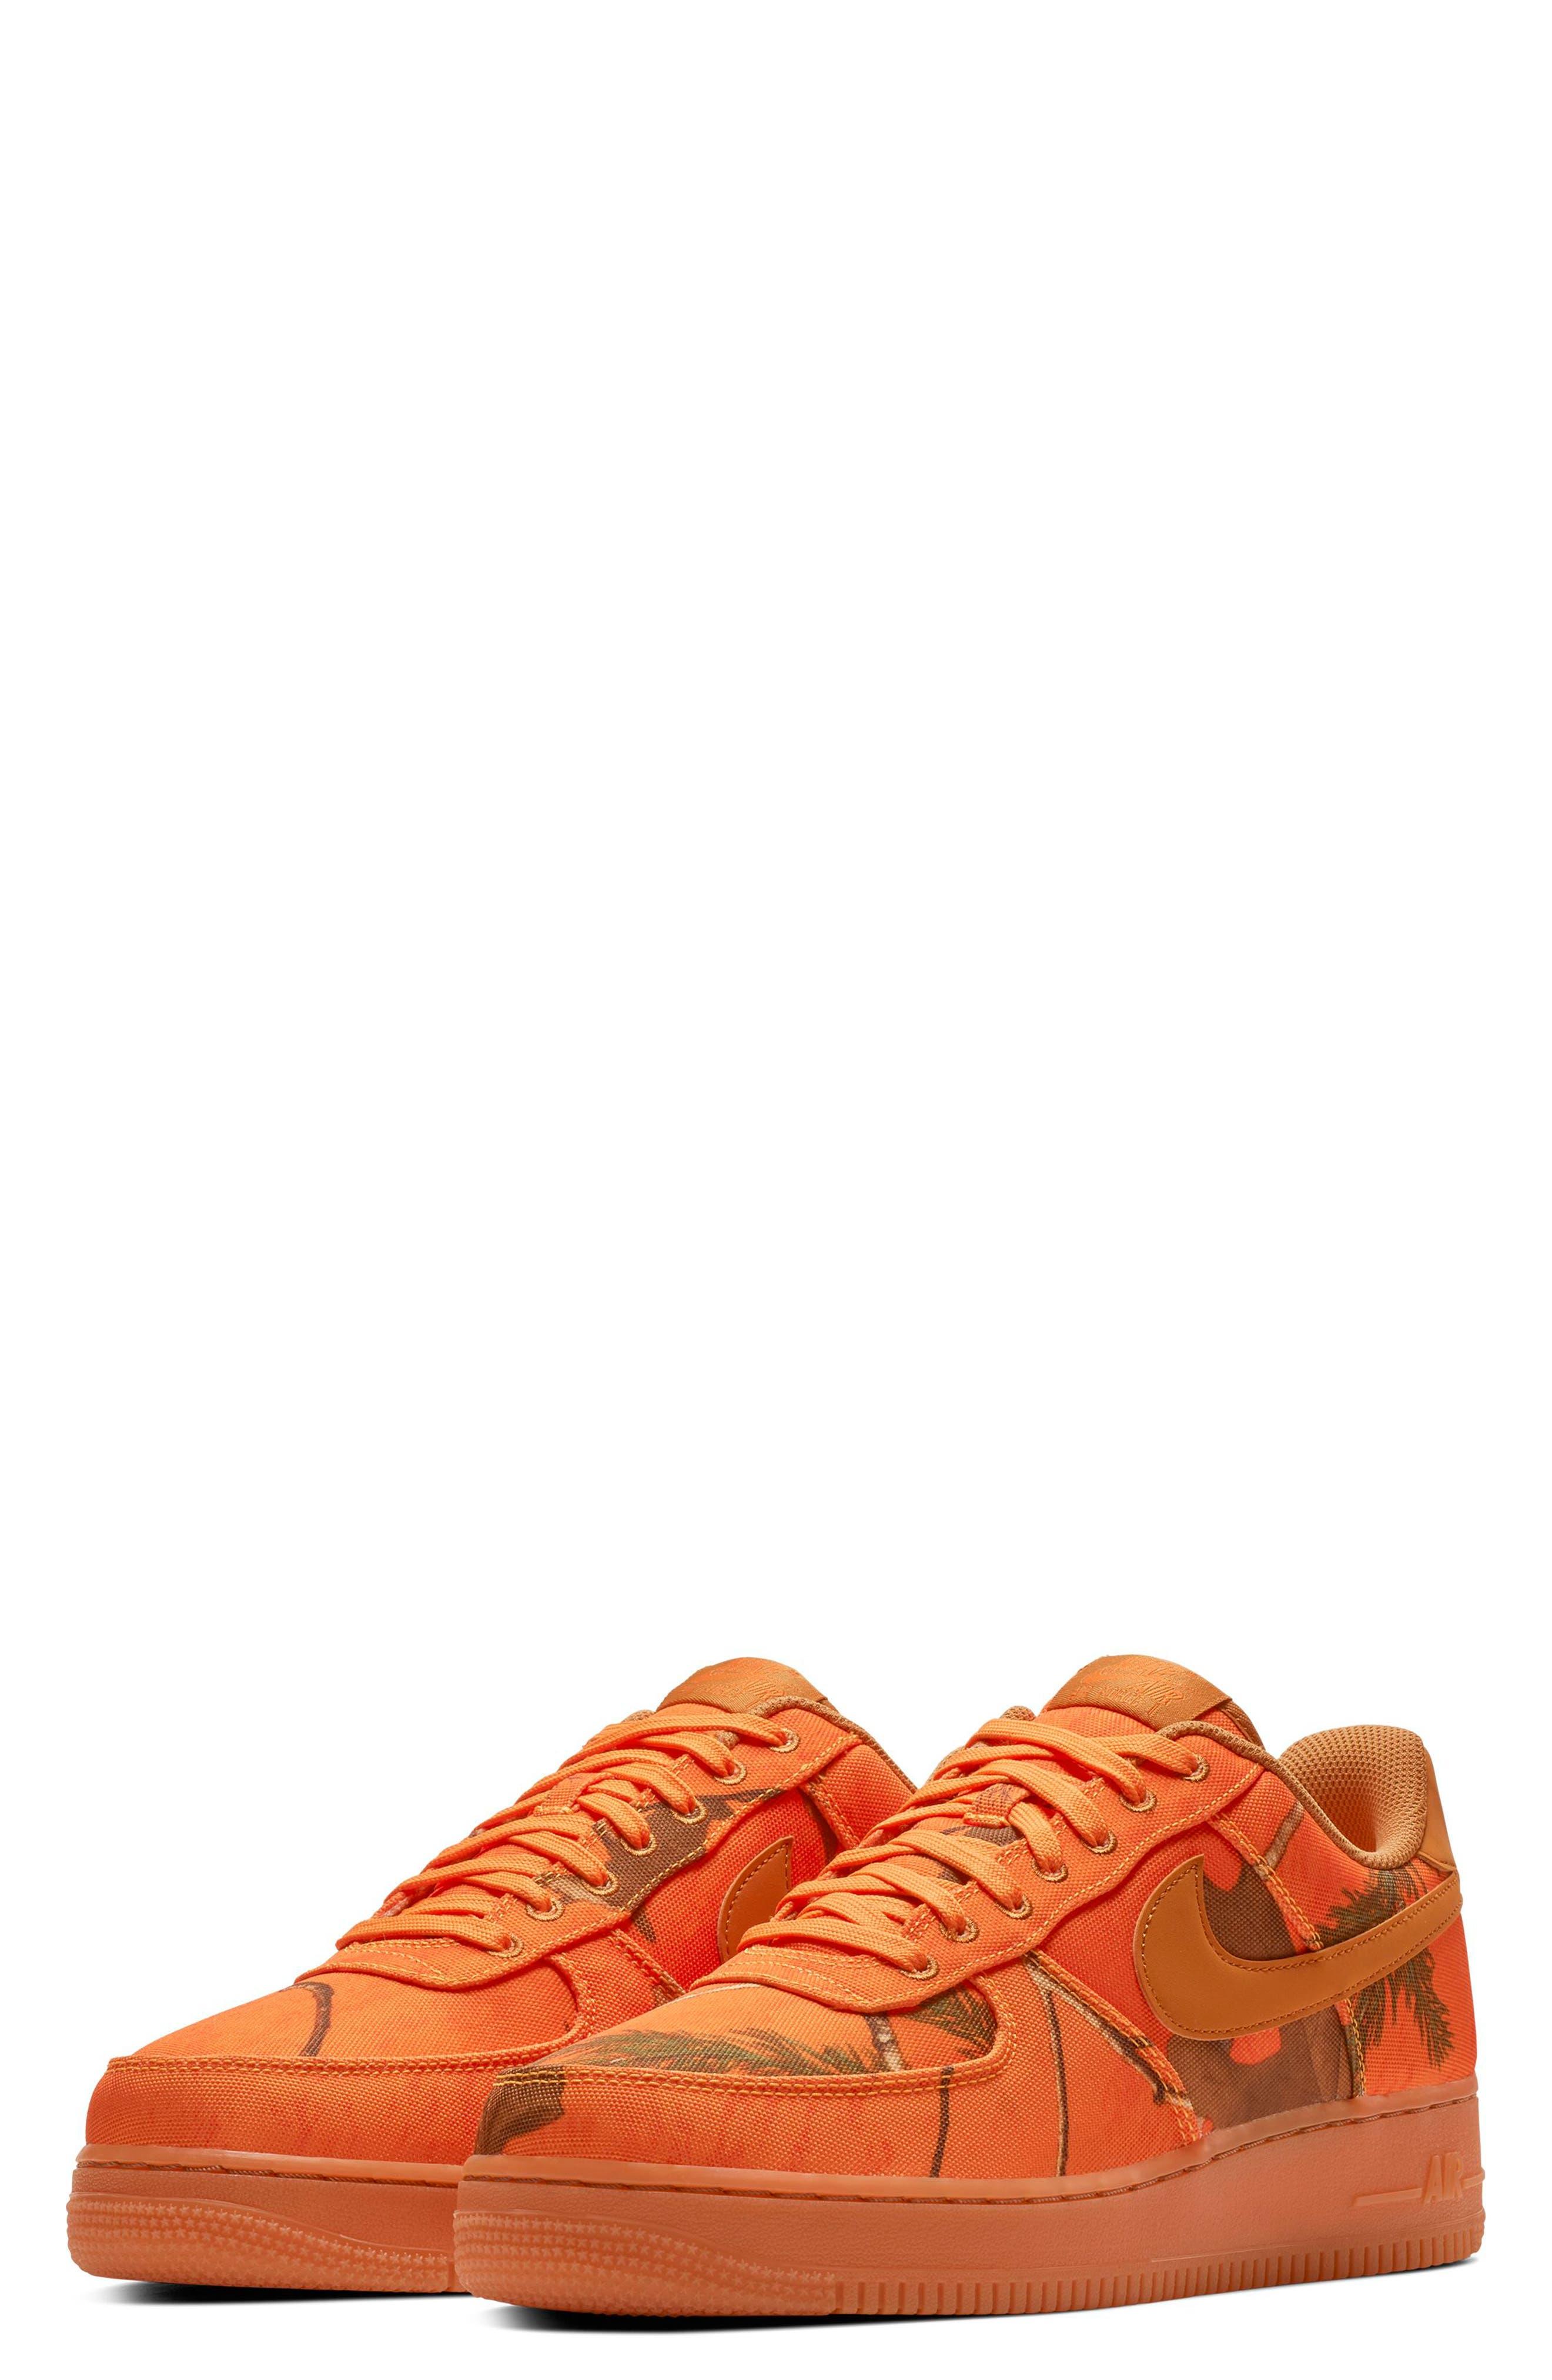 NIKE Air Force 1 '07 LV8 3 Sneaker, Main, color, ORANGE BLAZE/ WHITE/ BROWN